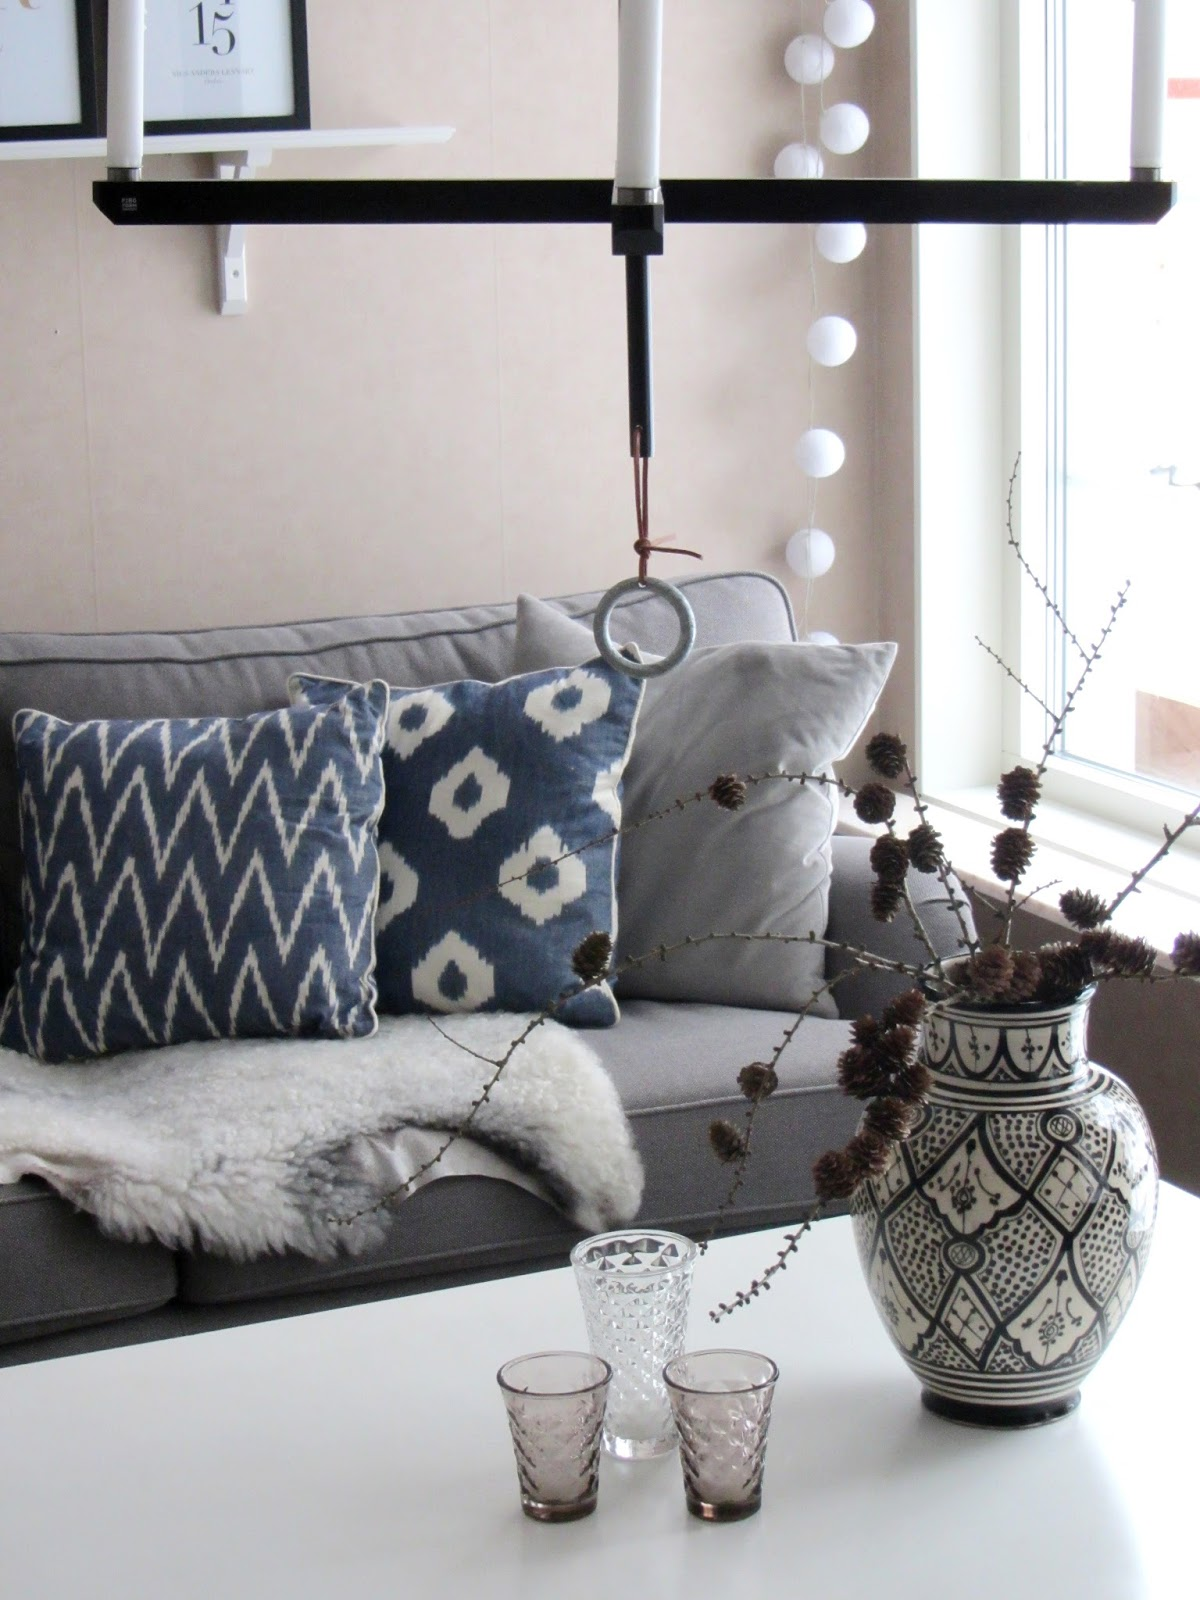 Sofis husdrömmar: Vinterpimpat vardagsrum!